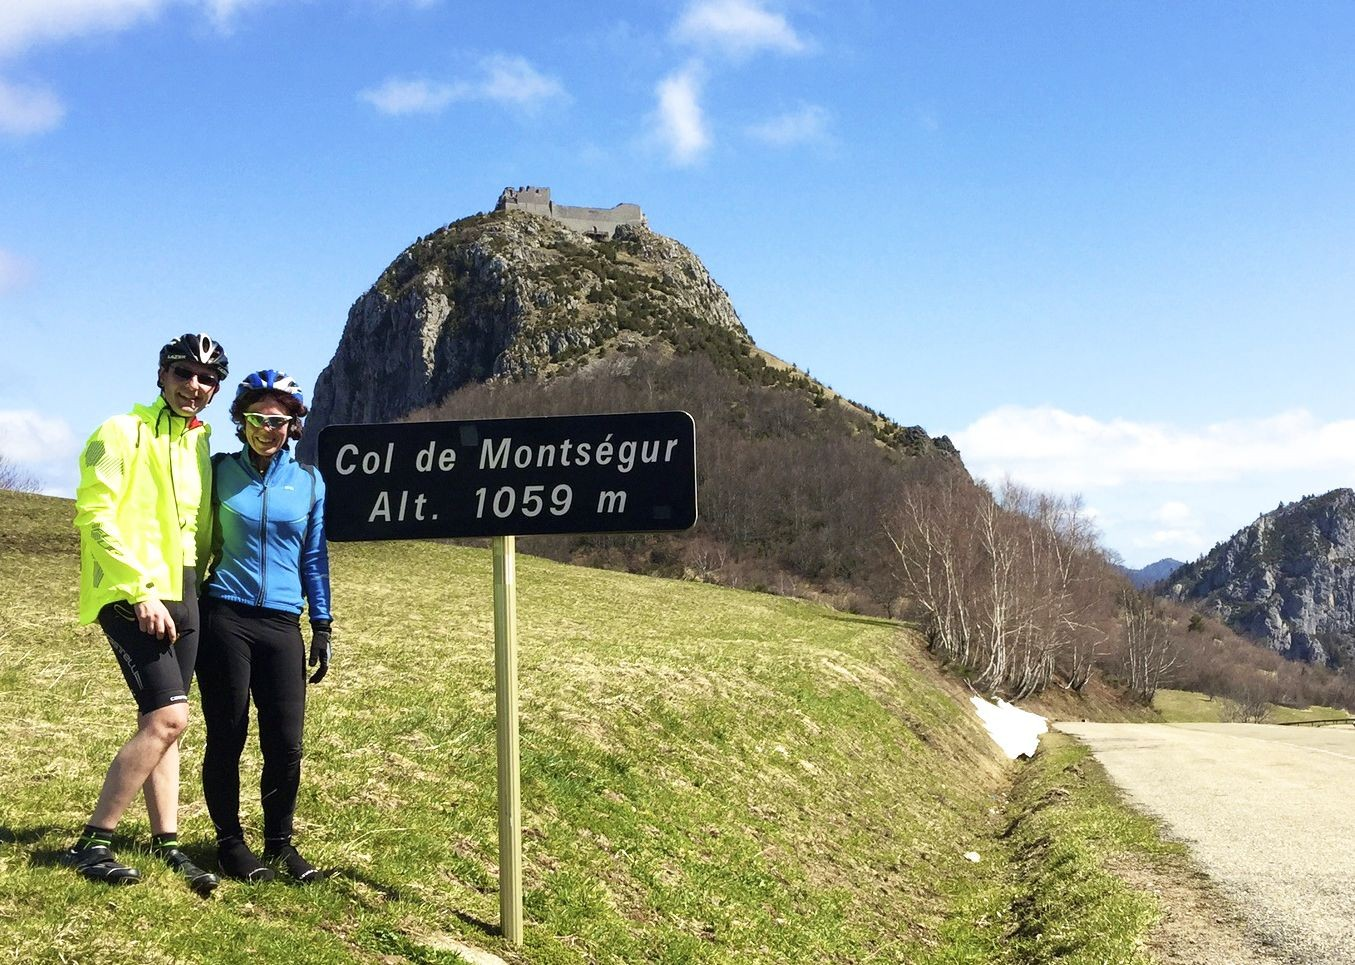 guided-road-cycling-holiday-france.jpg - France - Pyrenees Fitness Week - Guided Road Cycling Holiday (Grade 3-4) - Road Cycling